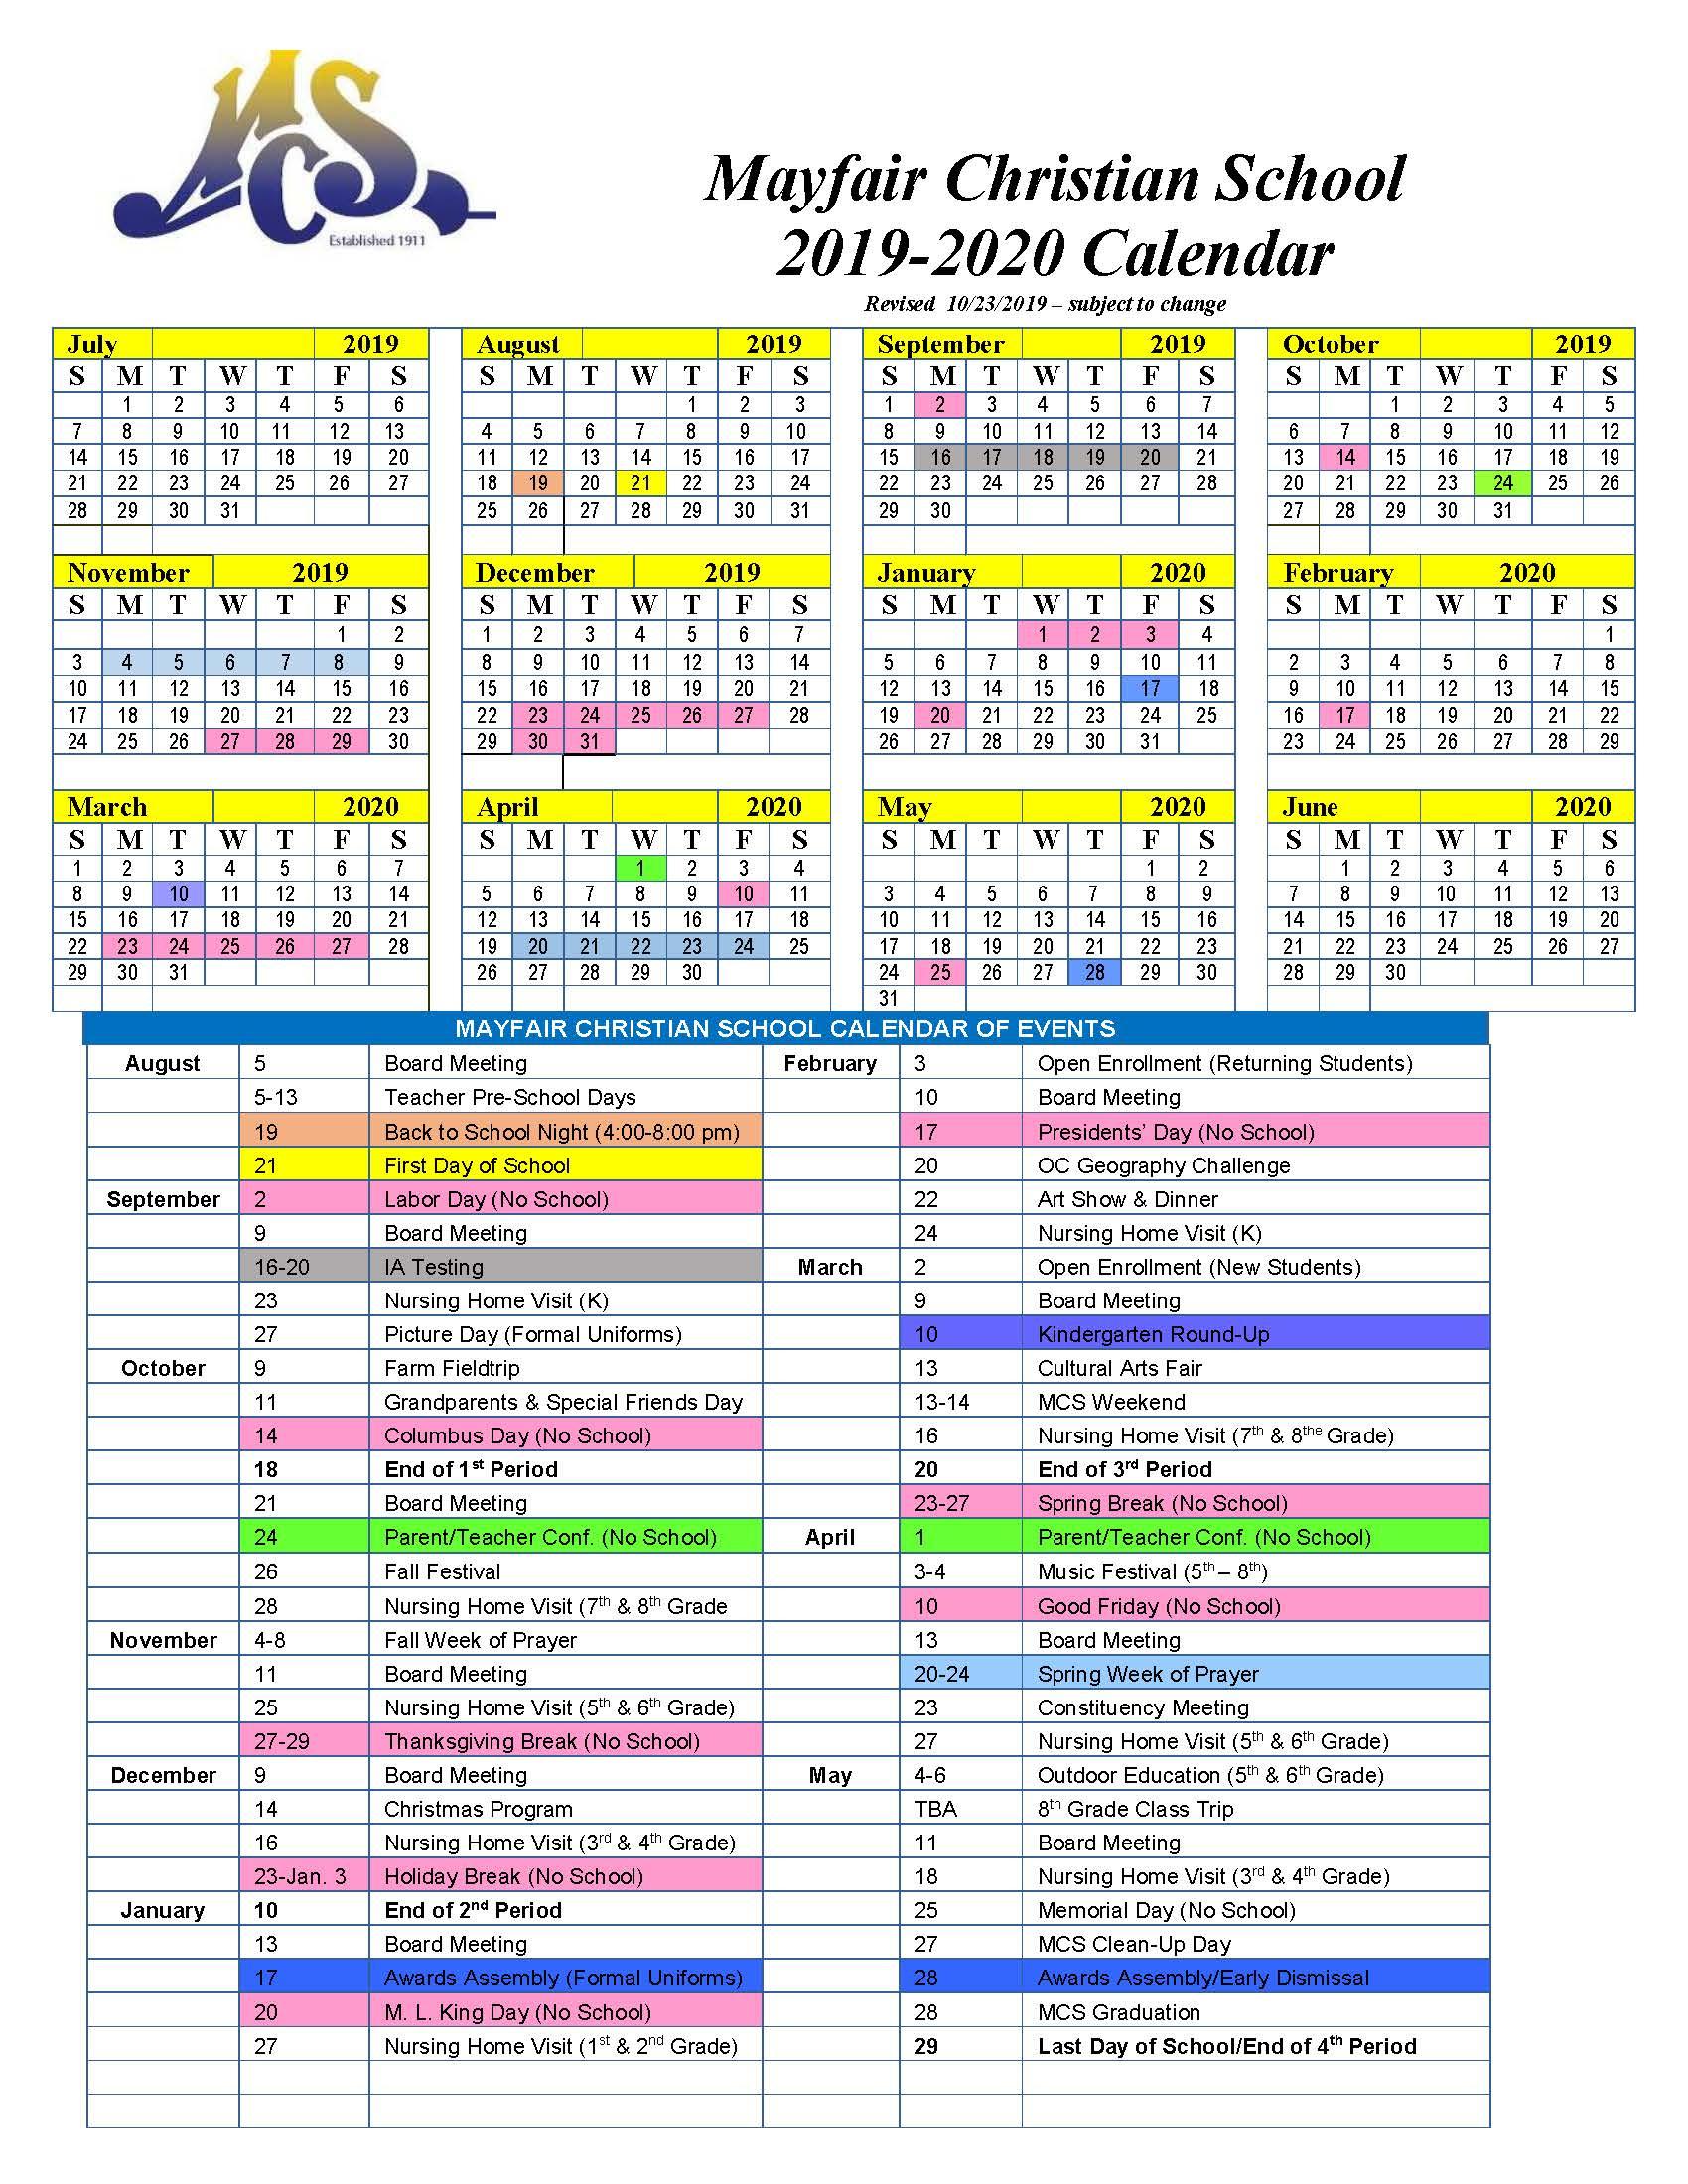 Calendar | Mayfair Christian School Within University Of Akron 2020 Calendar